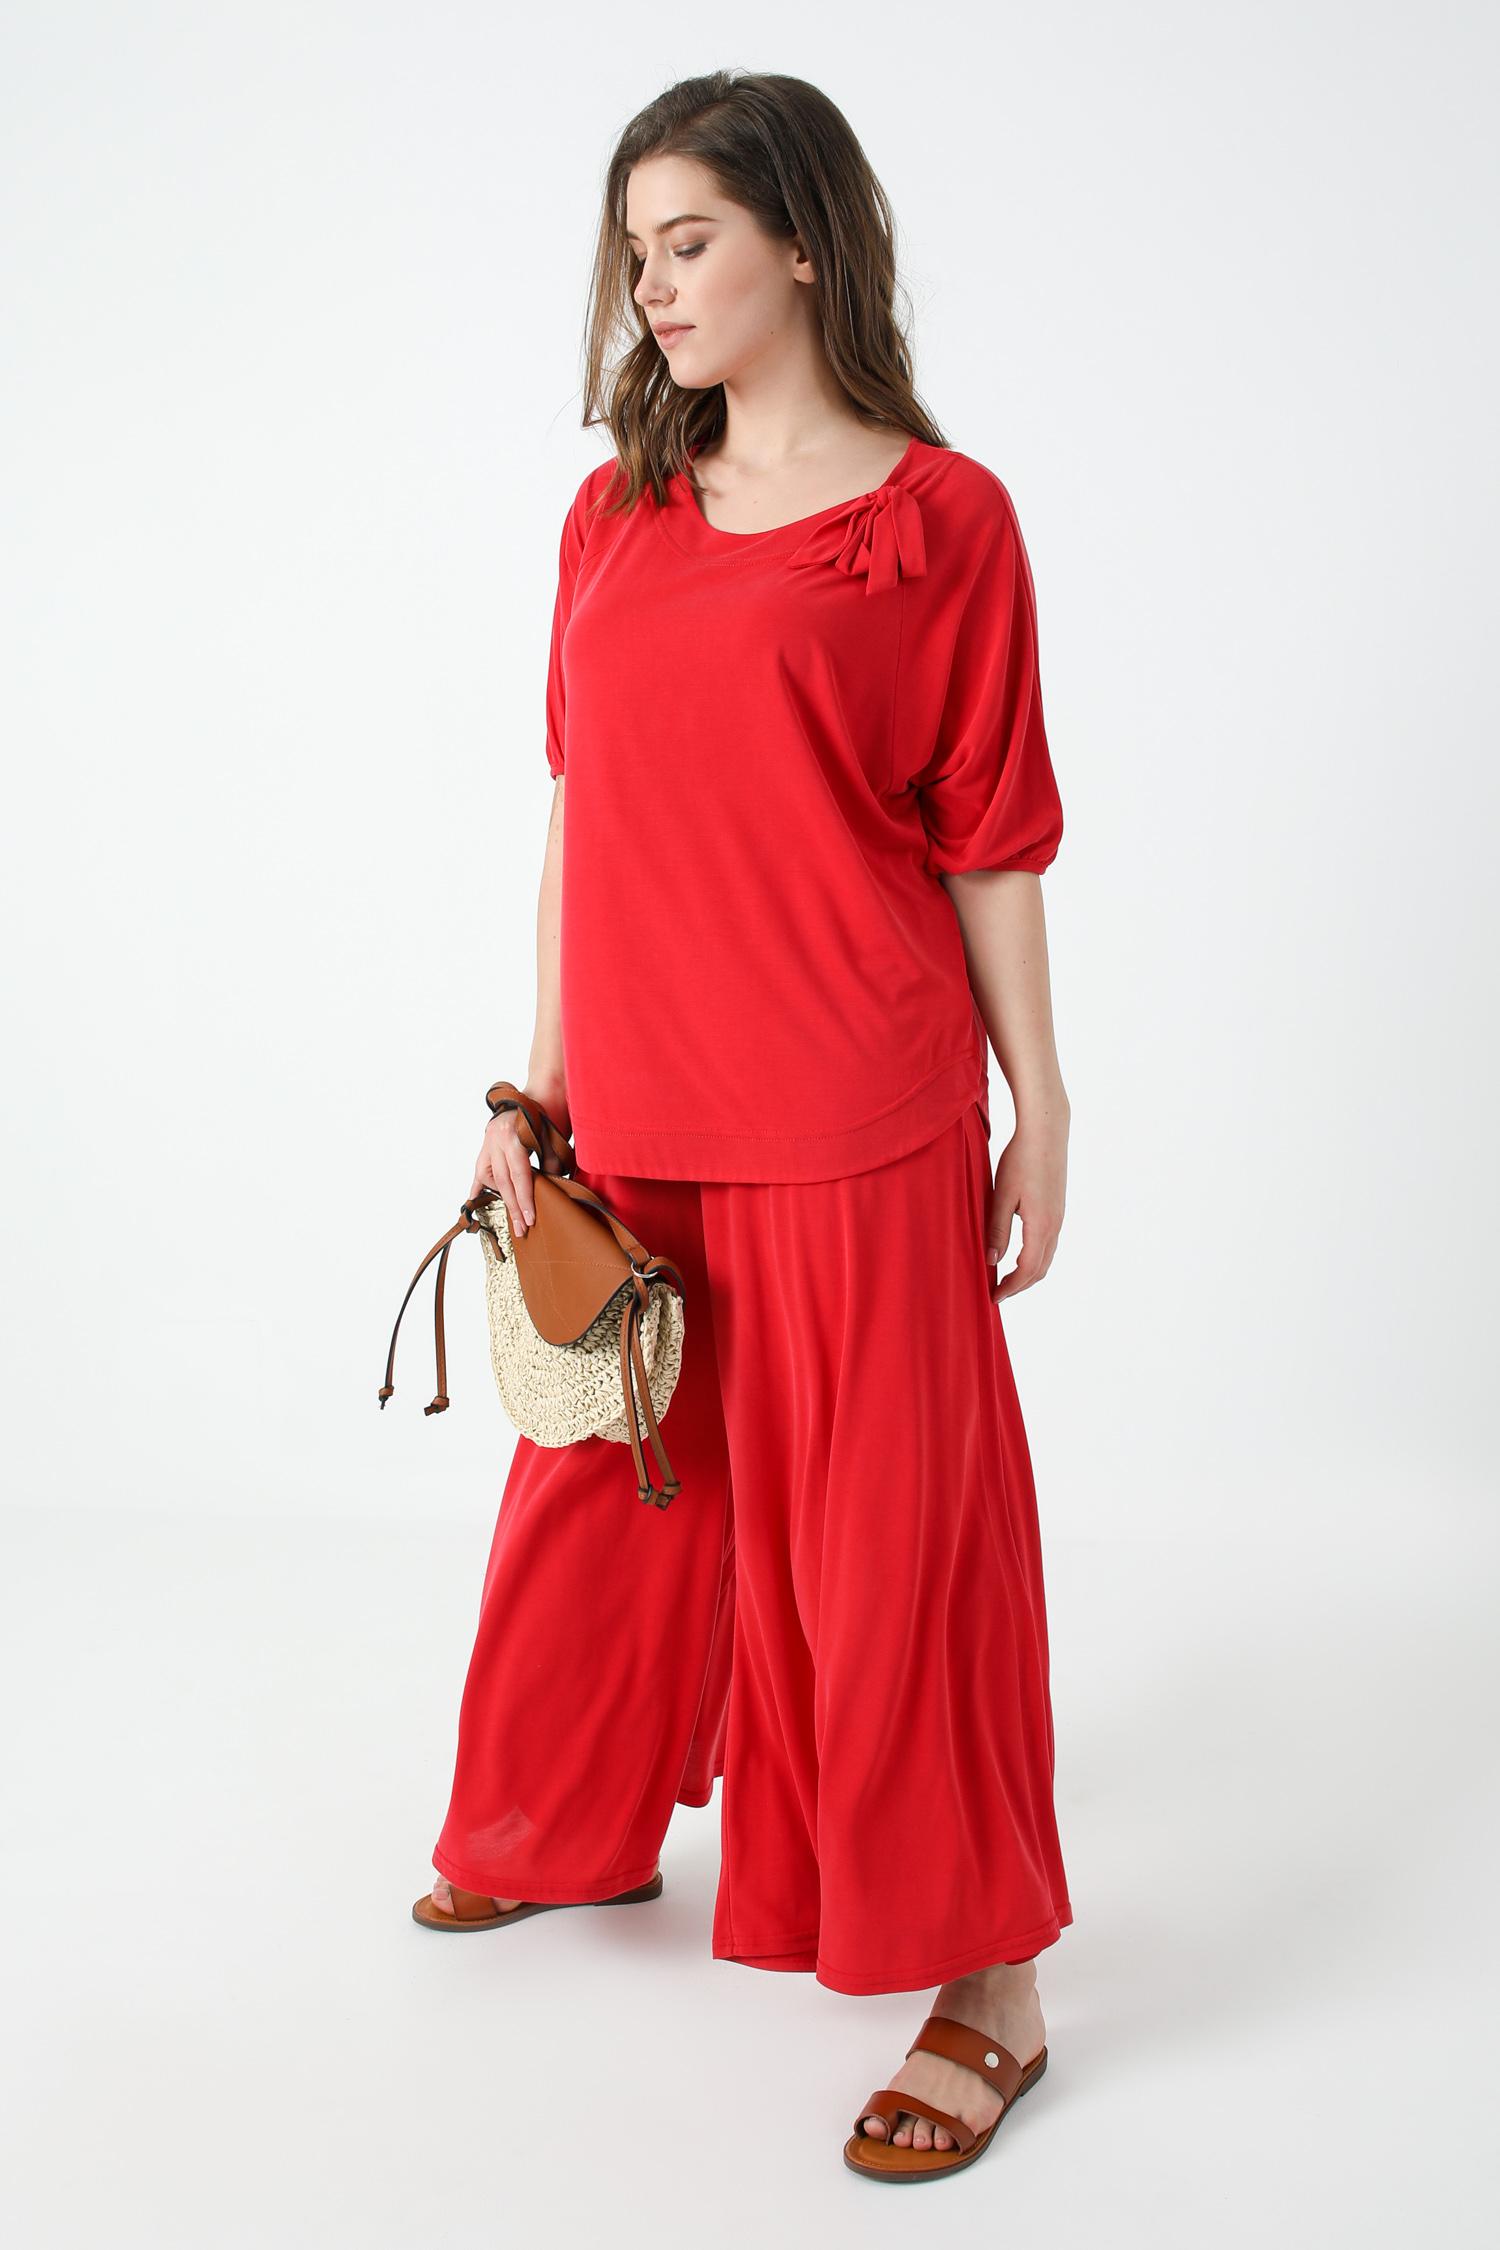 Plain modal t-shirt